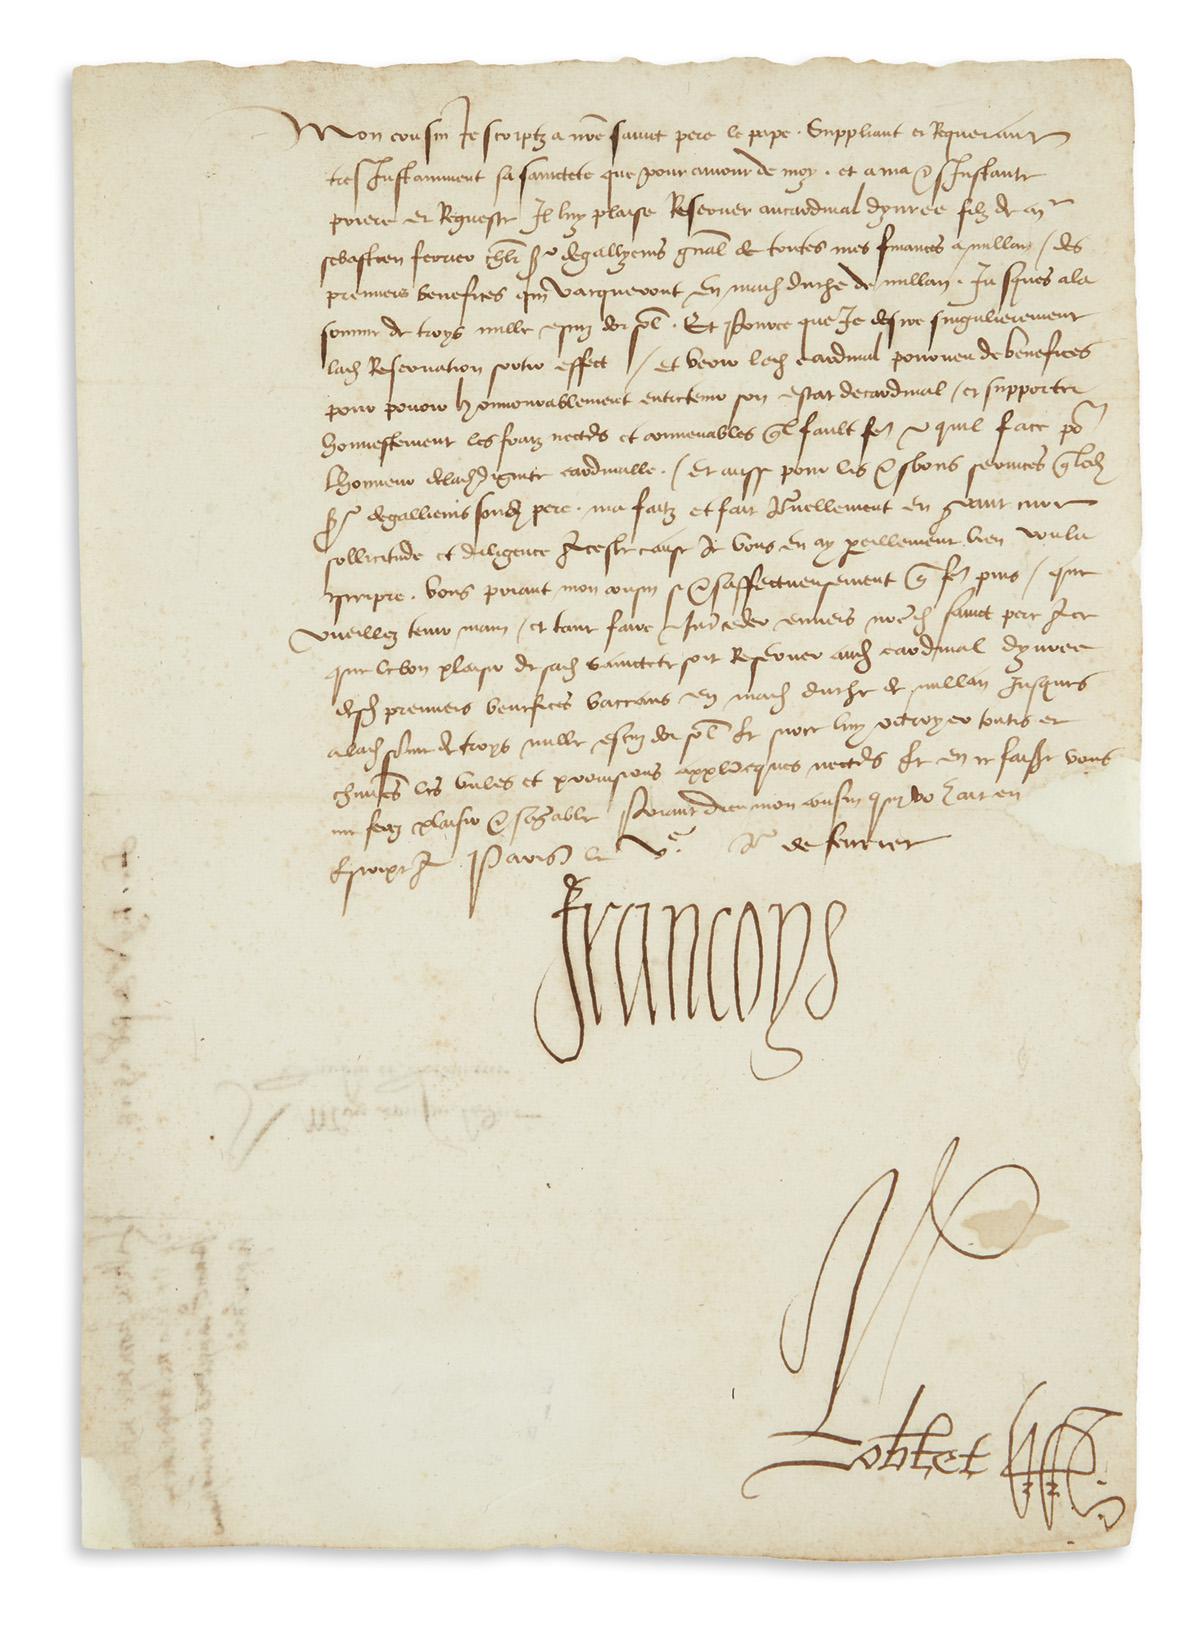 FRANCIS-I;-KING-OF-FRANCE-Letter-Signed-Francoys-to-the-Duke